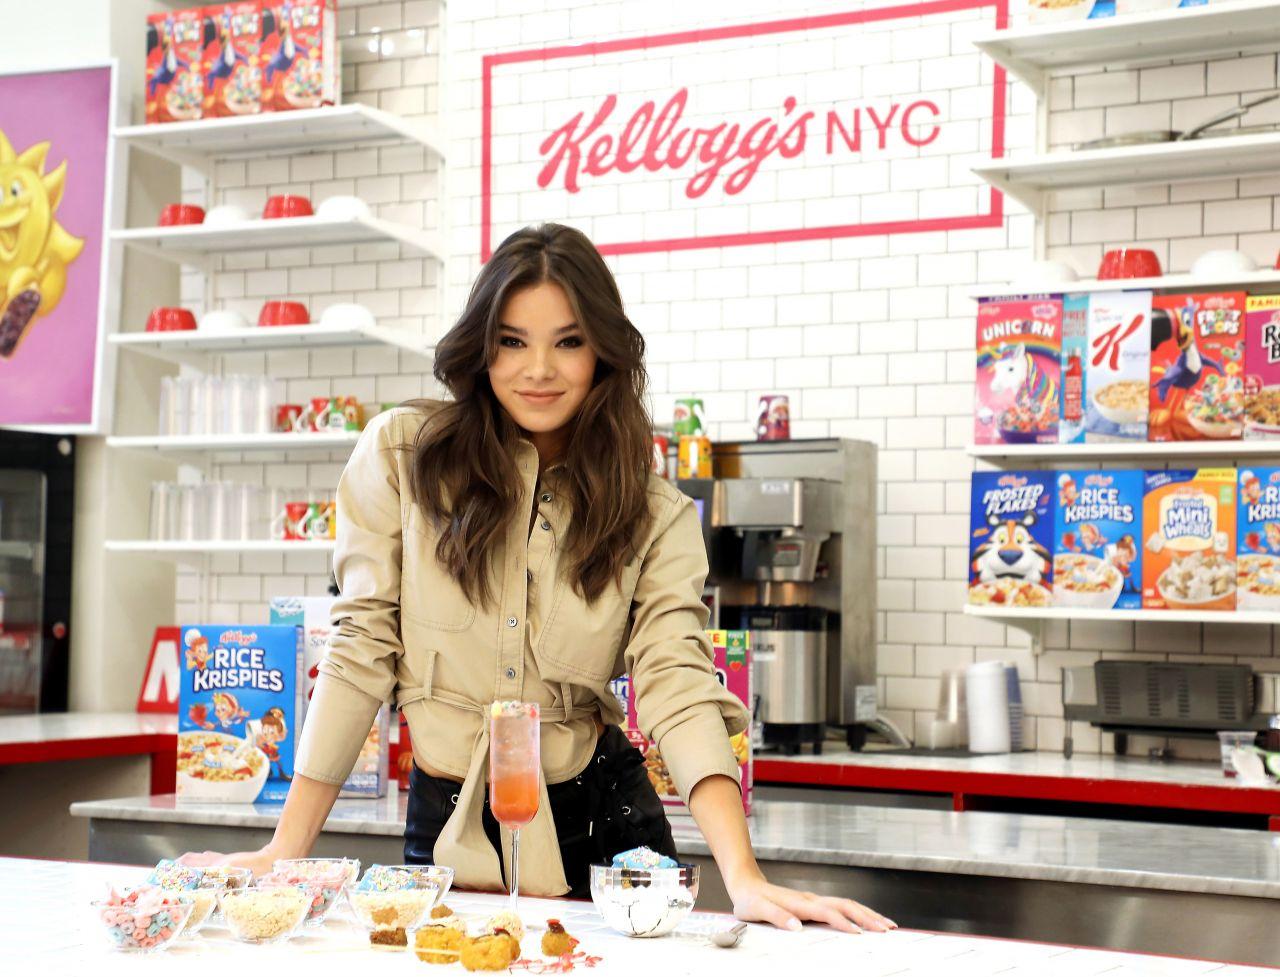 http://celebmafia.com/wp-content/uploads/2018/03/hailee-steinfeld-at-kellogg-s-new-york-city-cafe-in-nyc-0.jpg